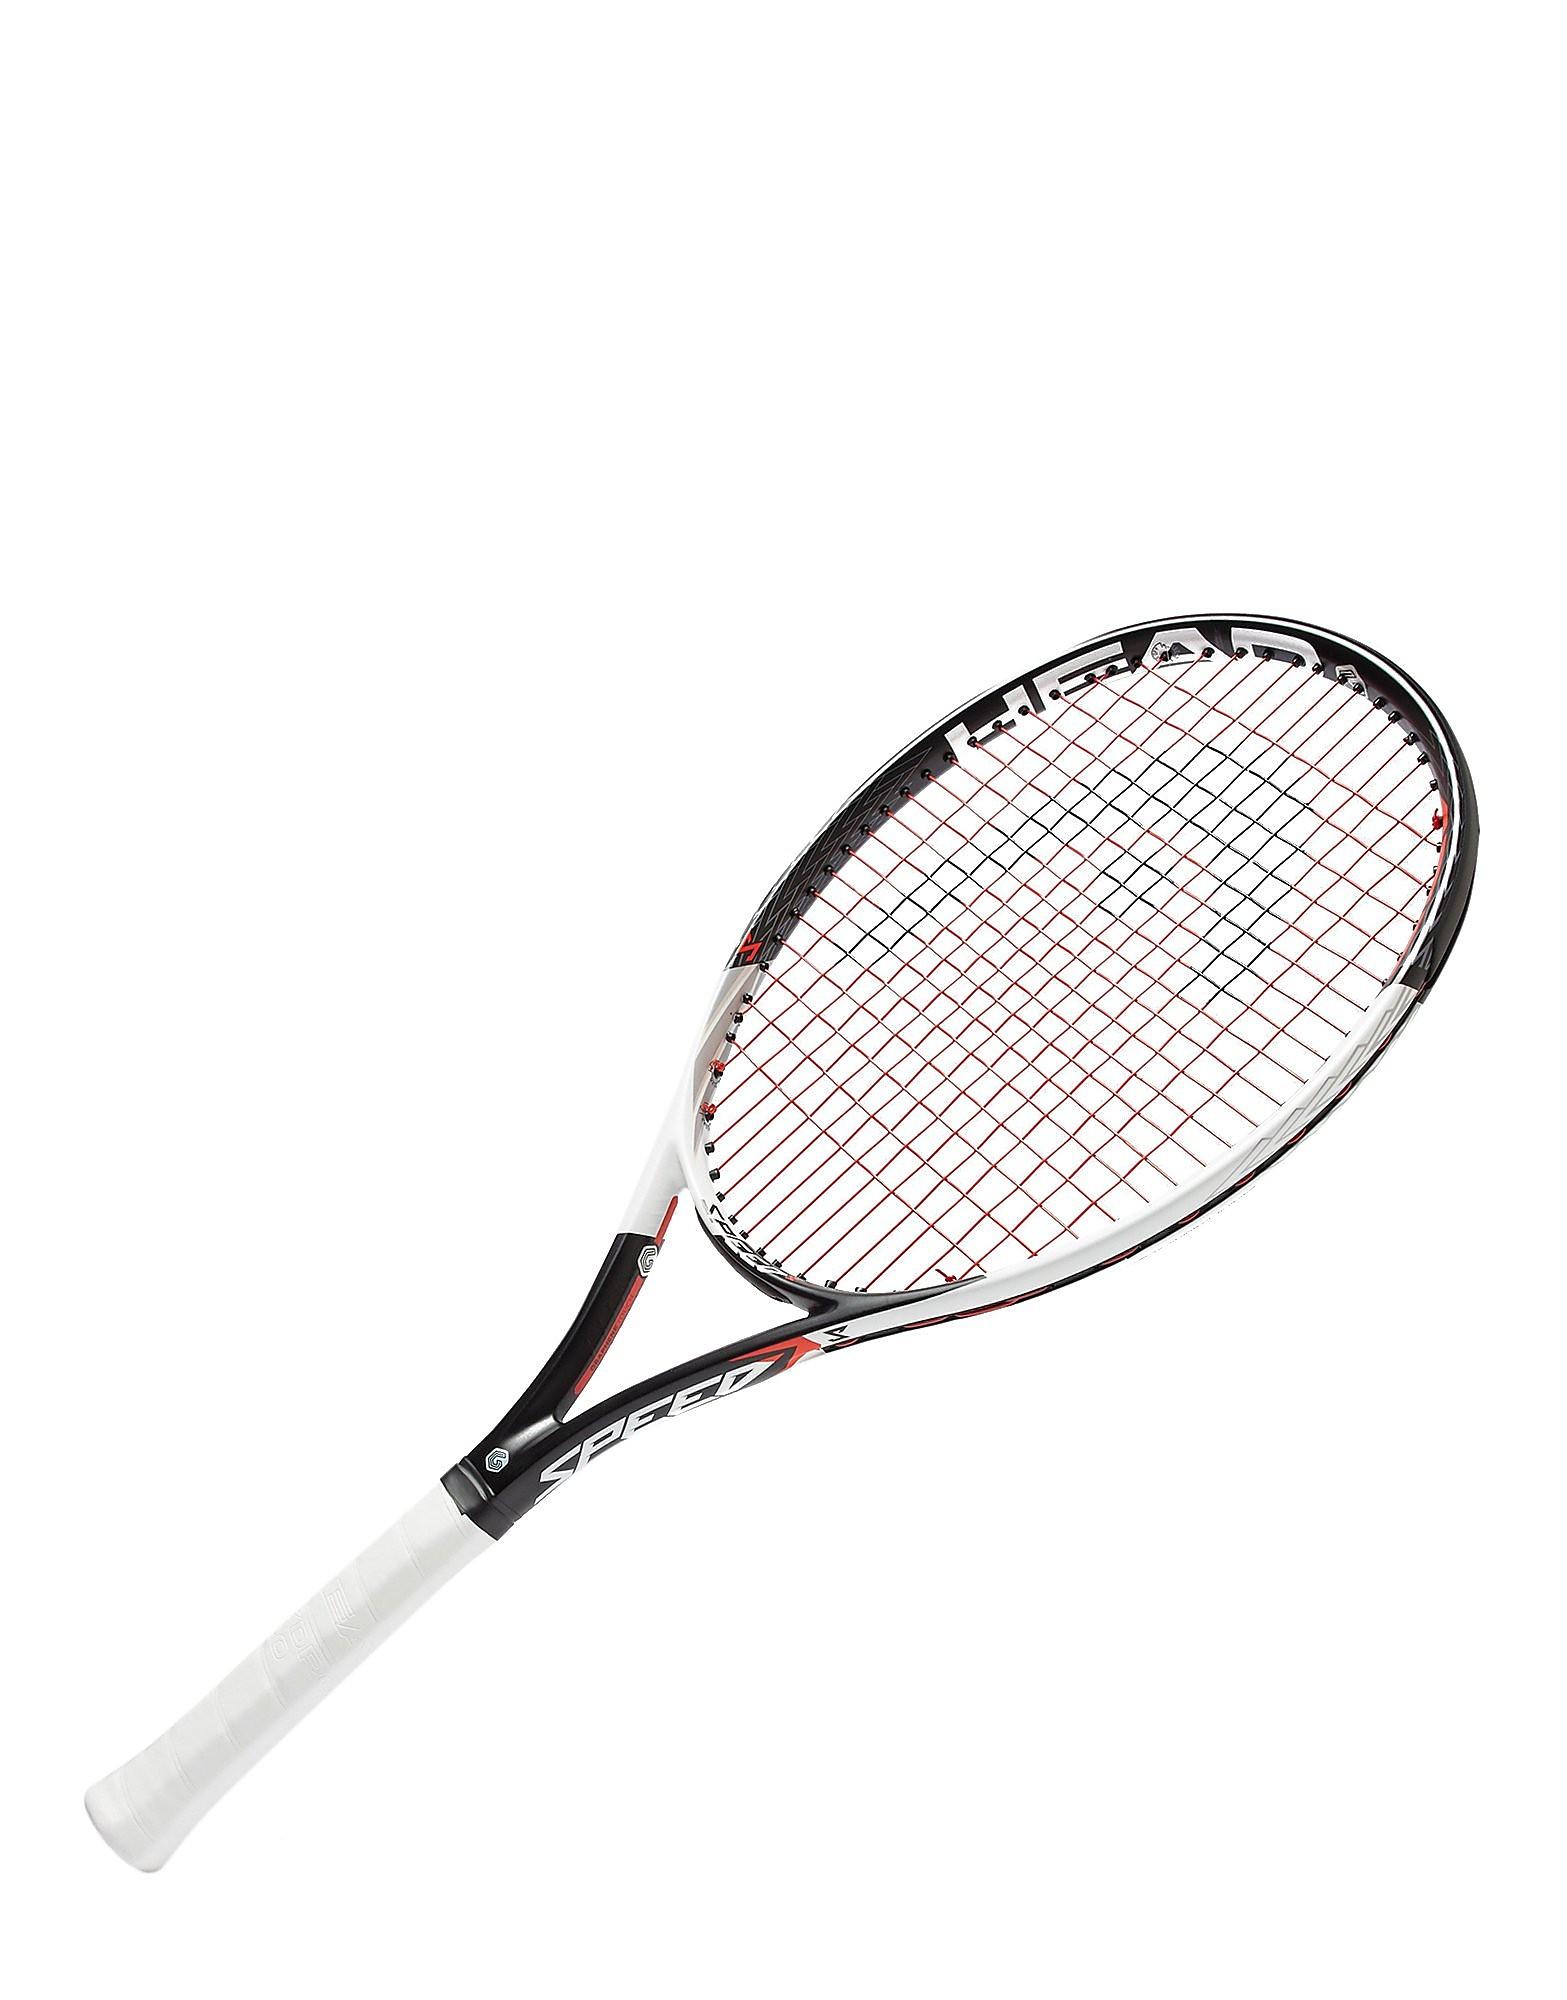 Head Graphene Touch Speed S Tennis Racket